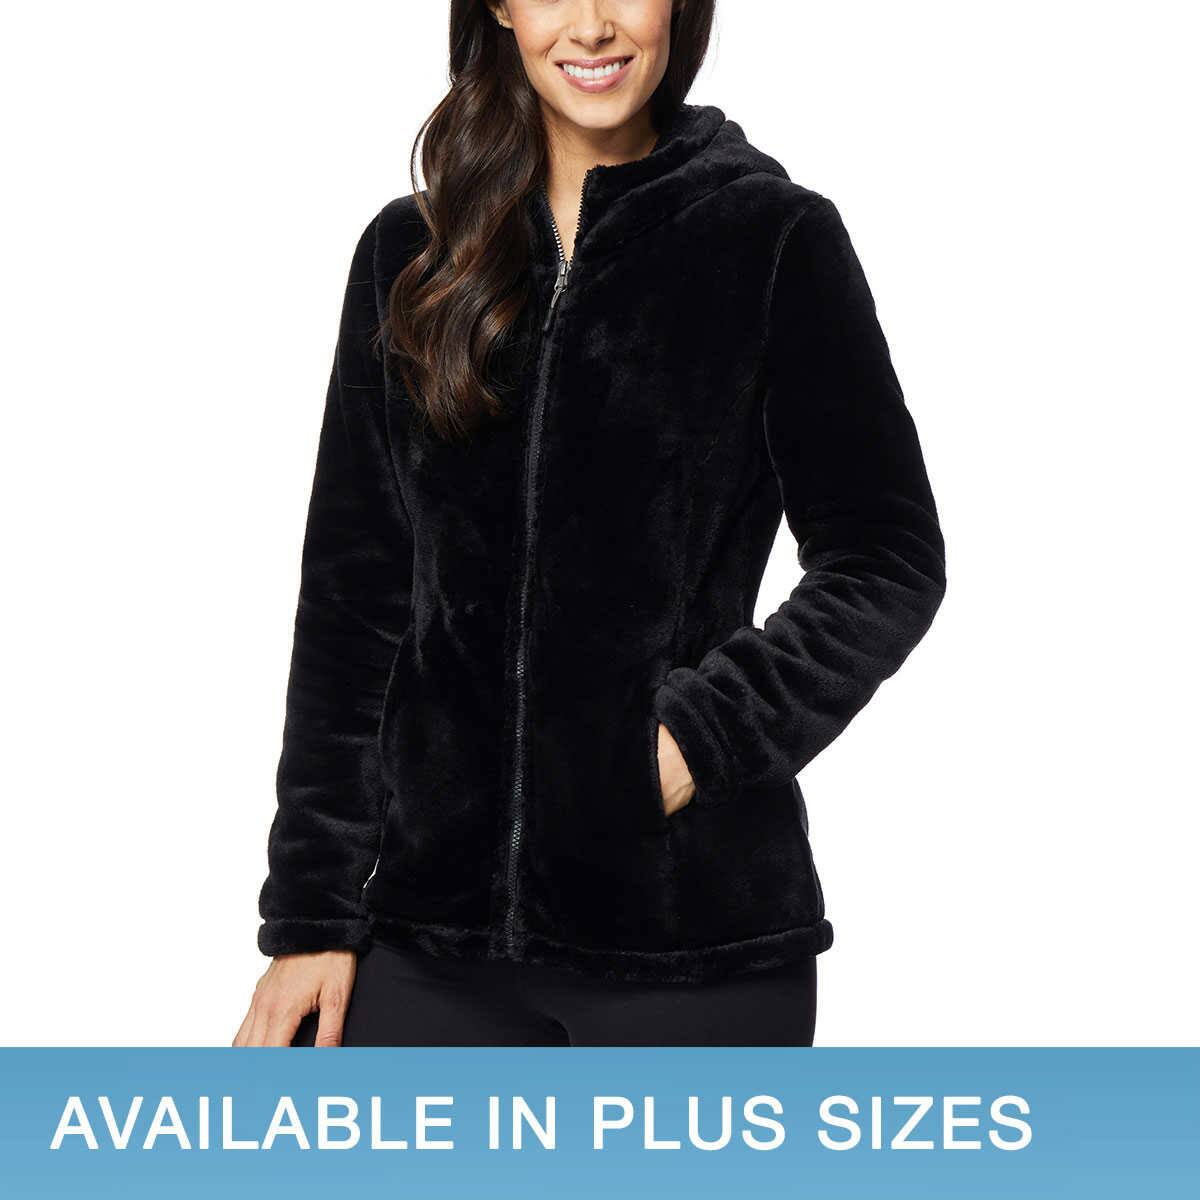 32 Degrees Ladies' Plush Jacket with Hood $13